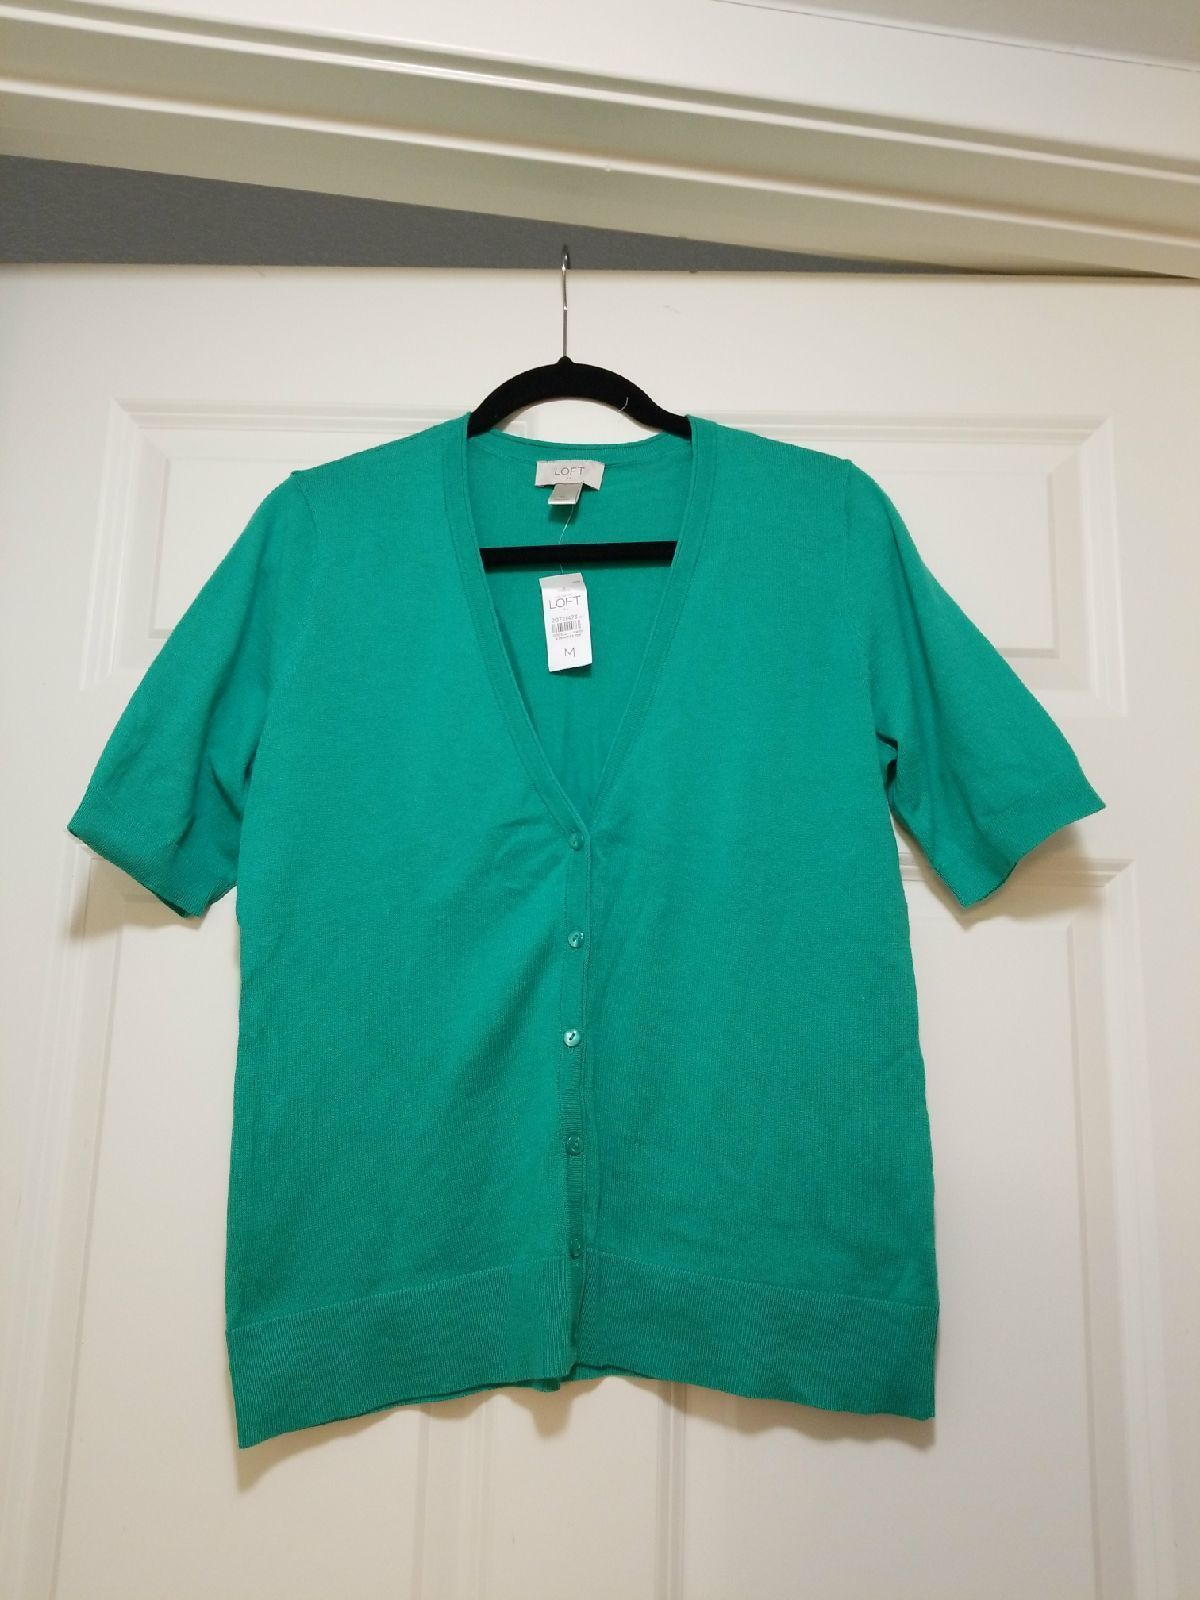 Green short sleeve cardigan - Mercari: BUY & SELL THINGS YOU LOVE